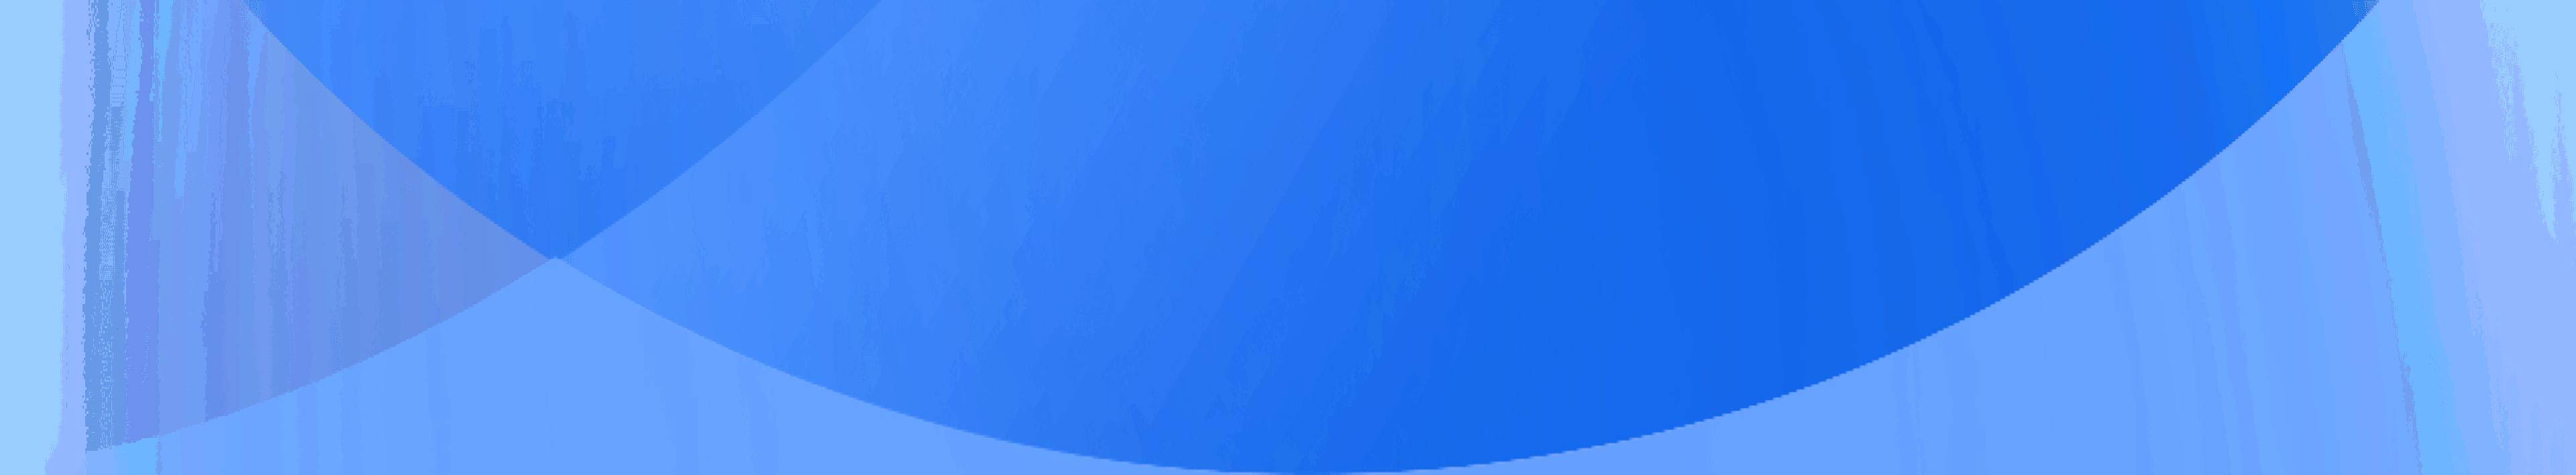 banner_new@2x.7b739629